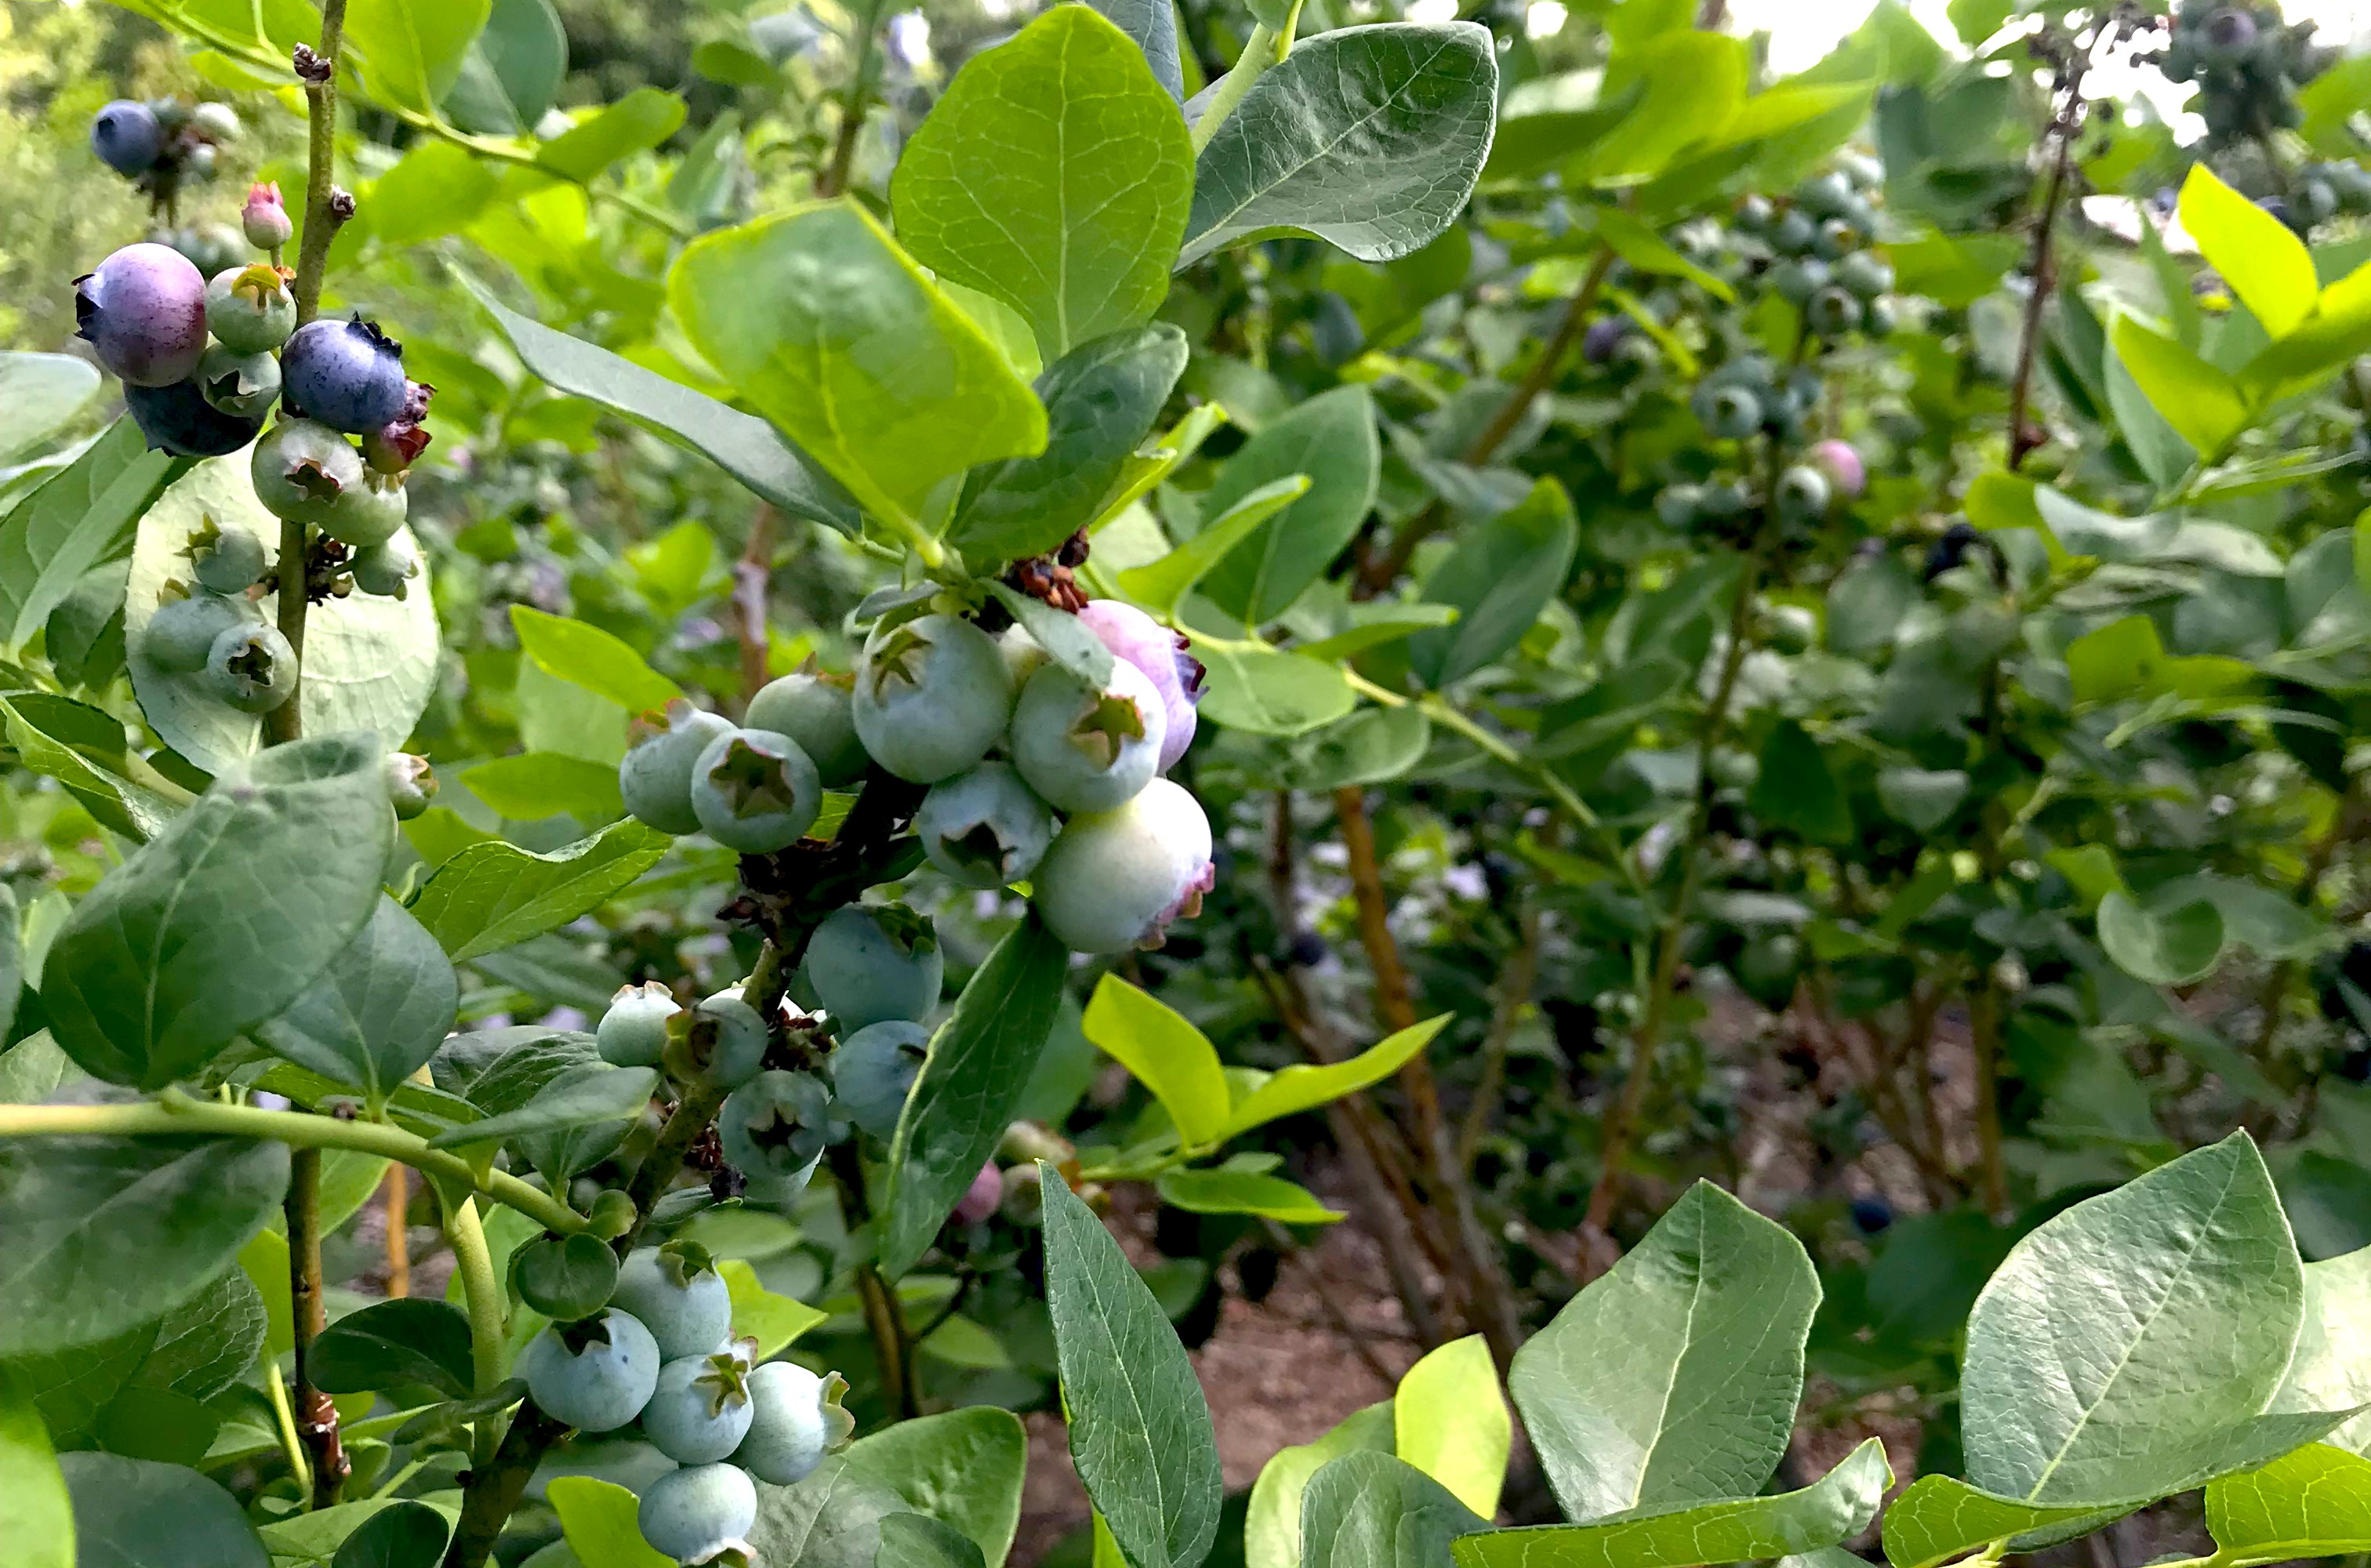 blueberrries 4.1